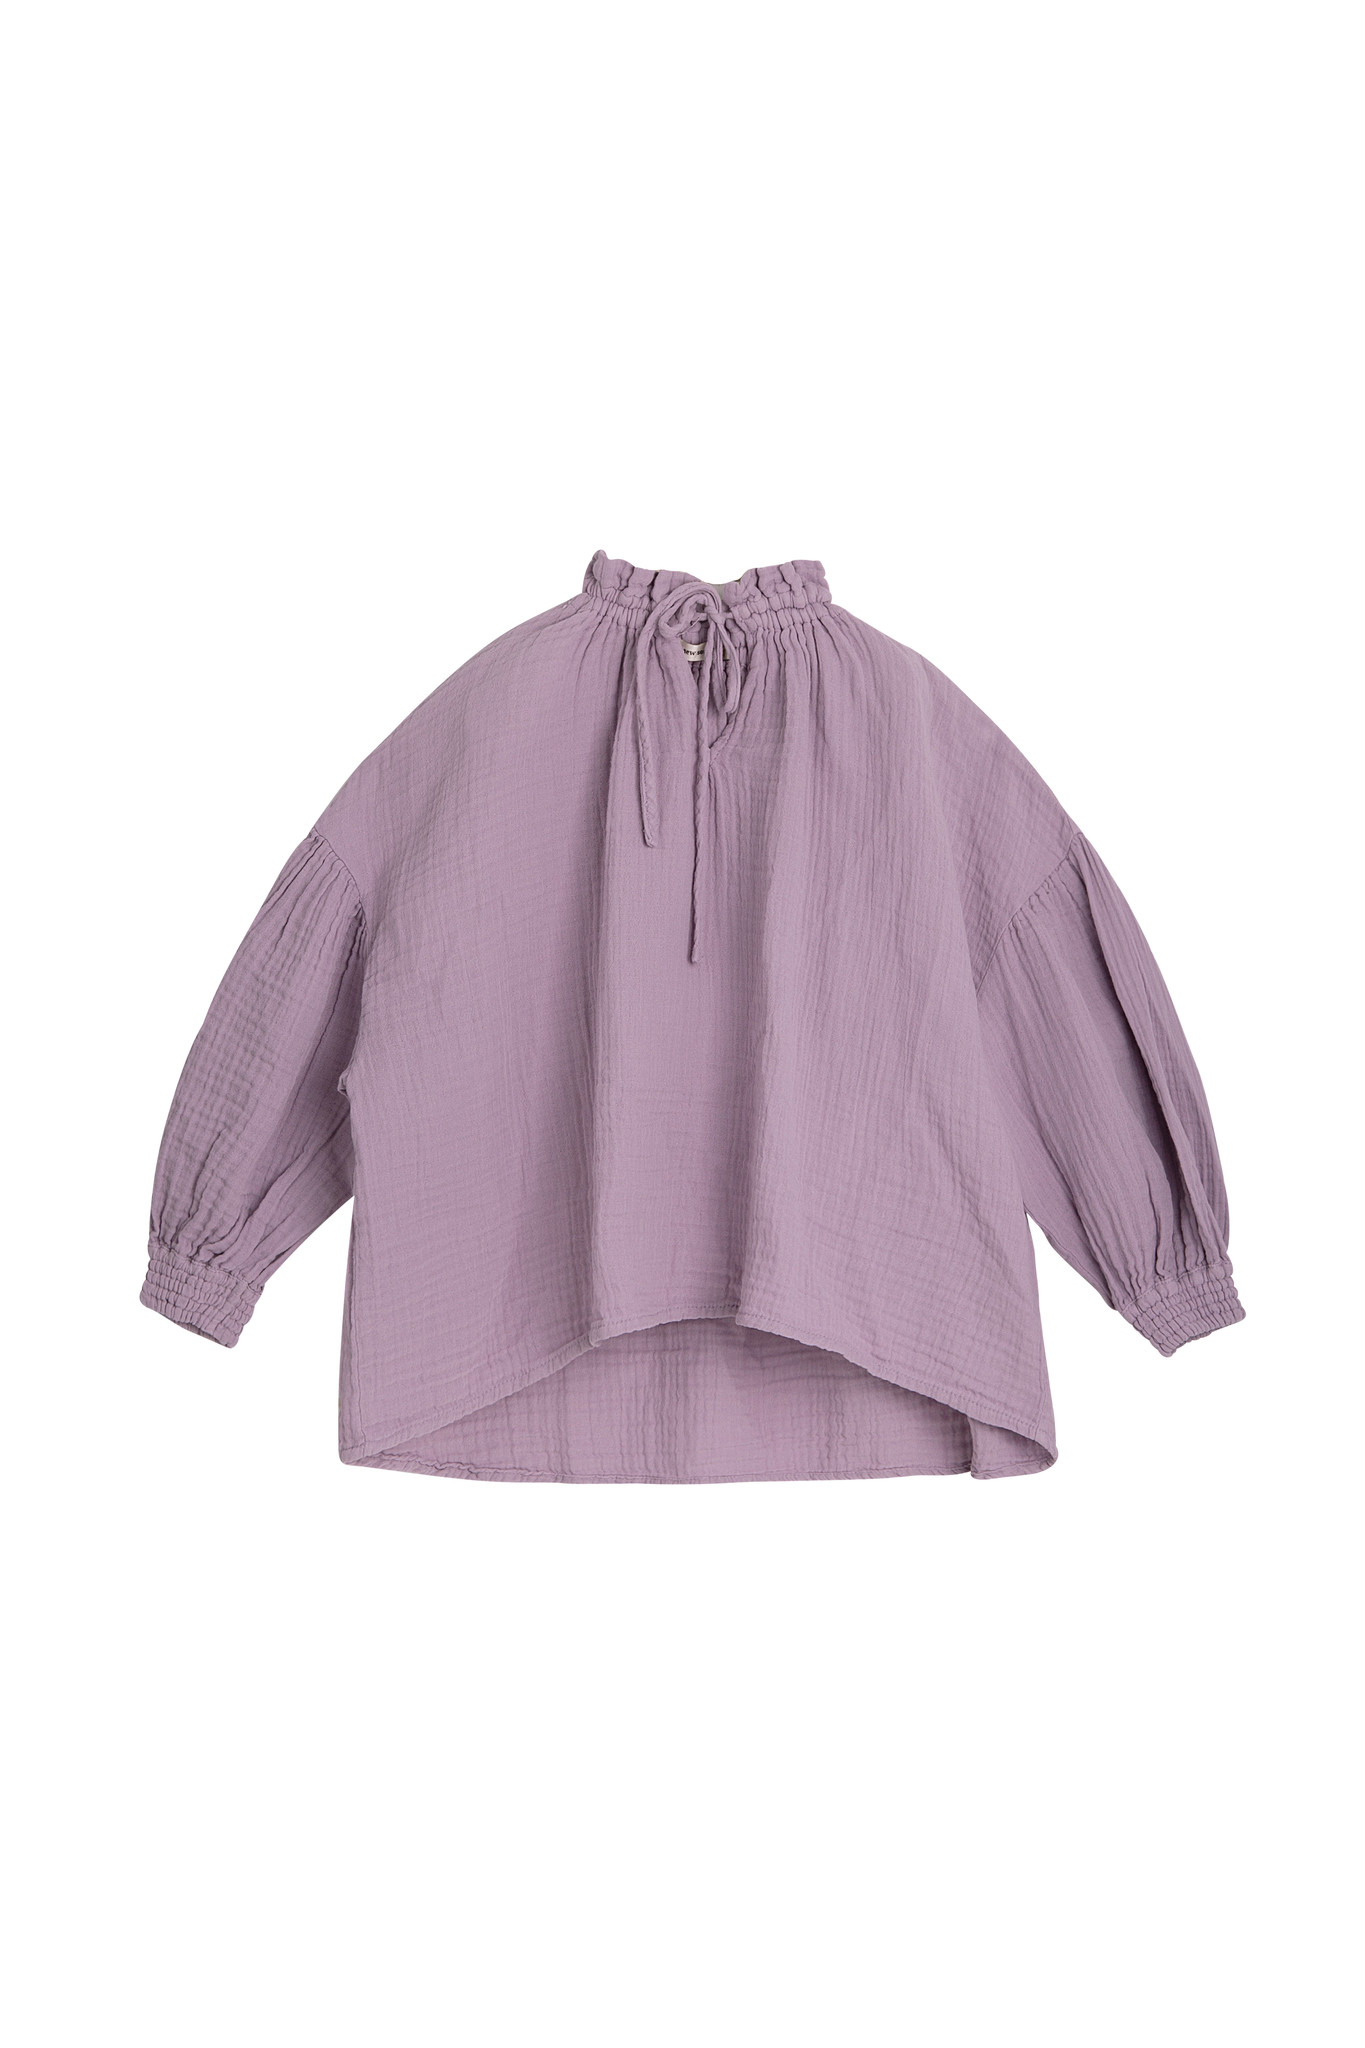 Olivia blouse - Lavanda-1